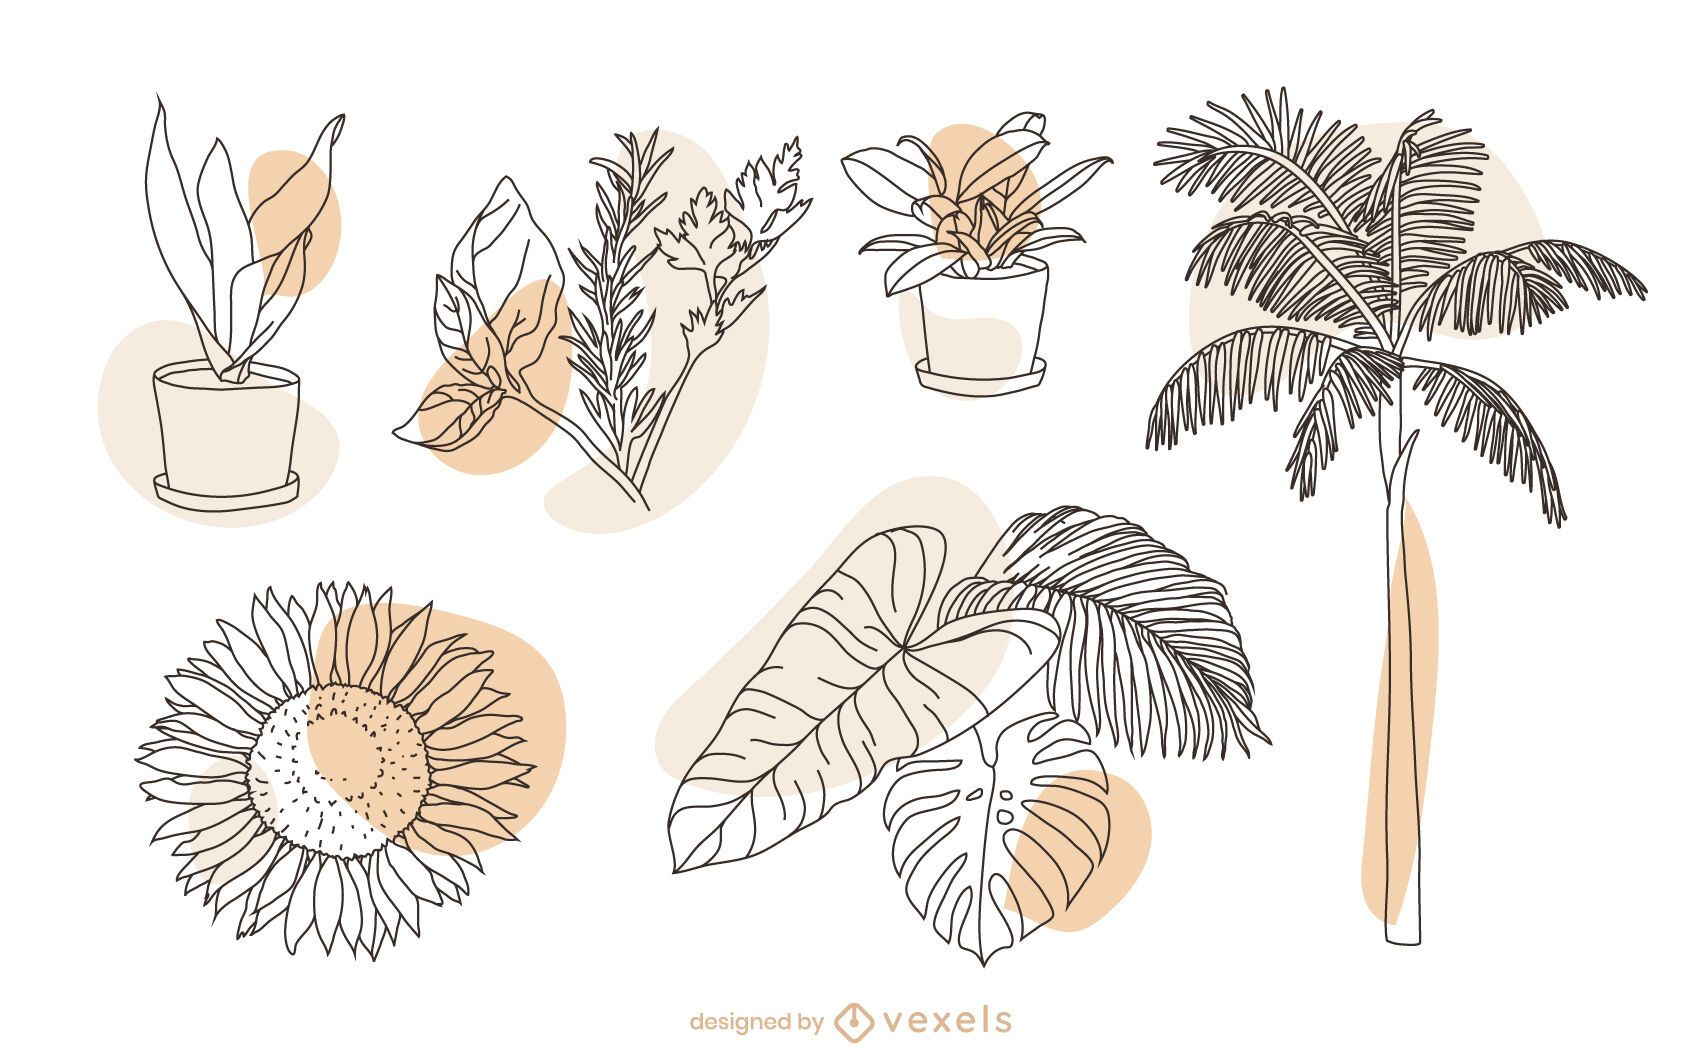 Conjunto de elementos de naturaleza vegetal